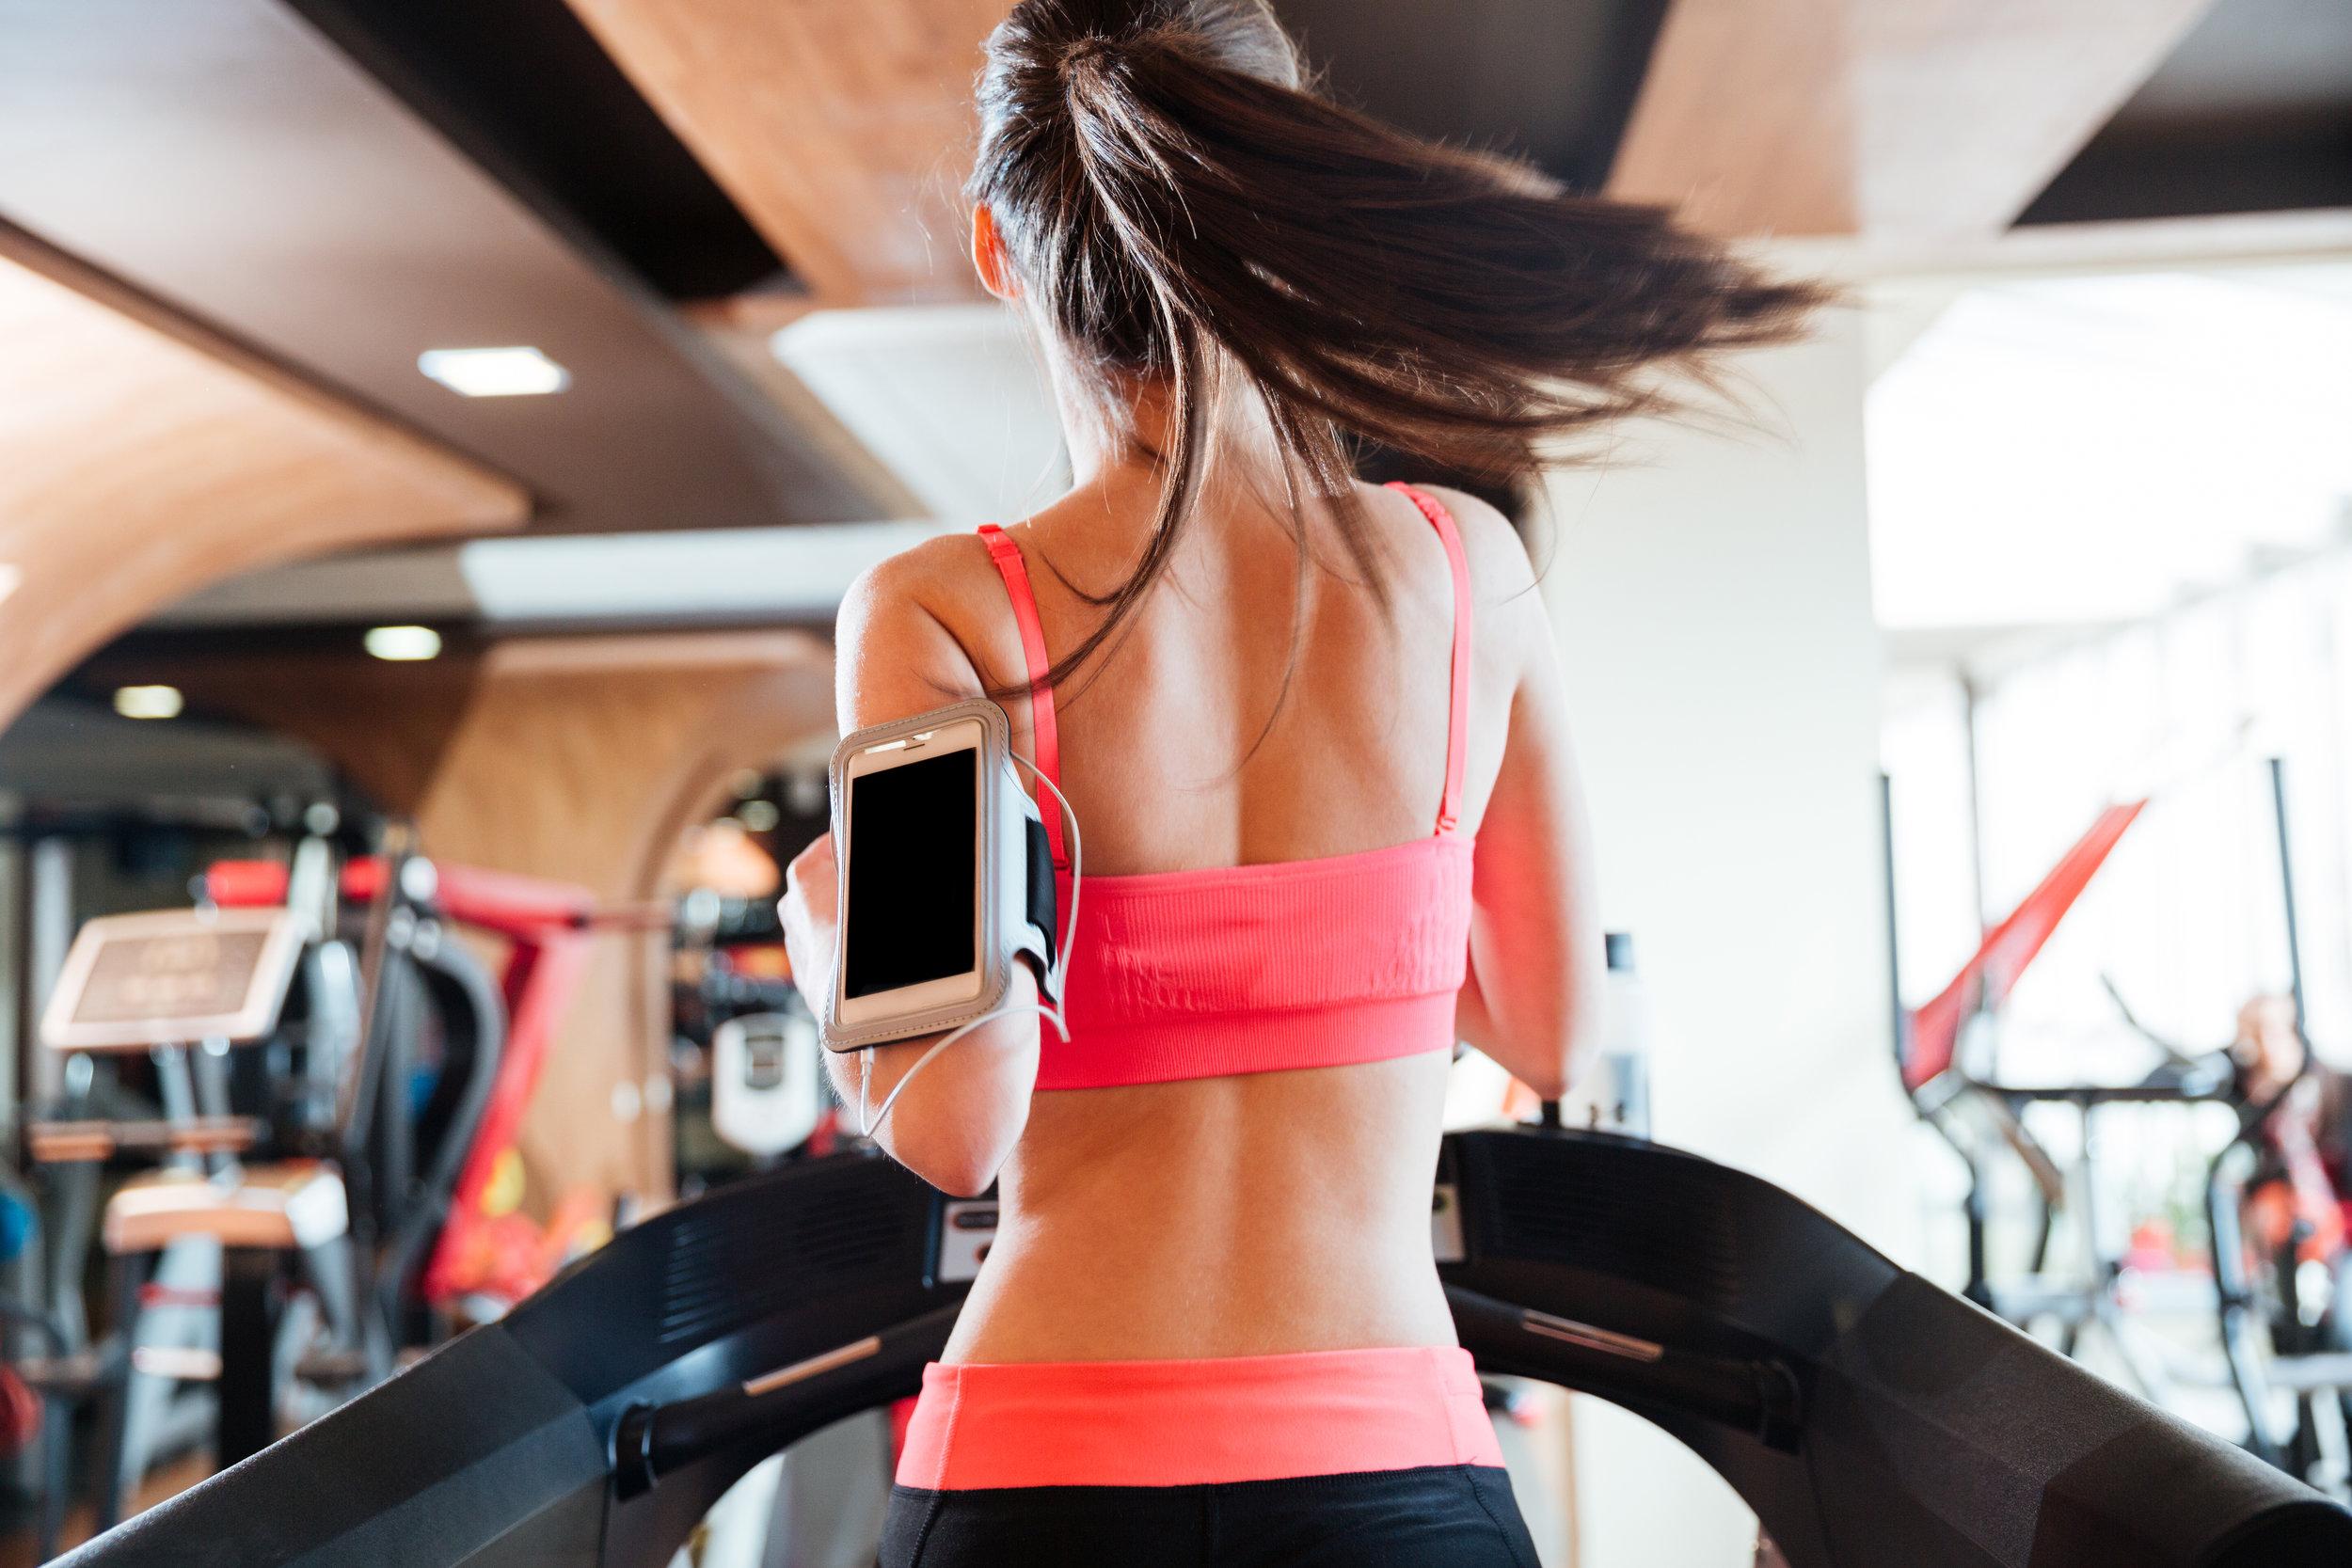 woman-athlete-with-balnk-screen-smartphone-PH7U4RV.JPG